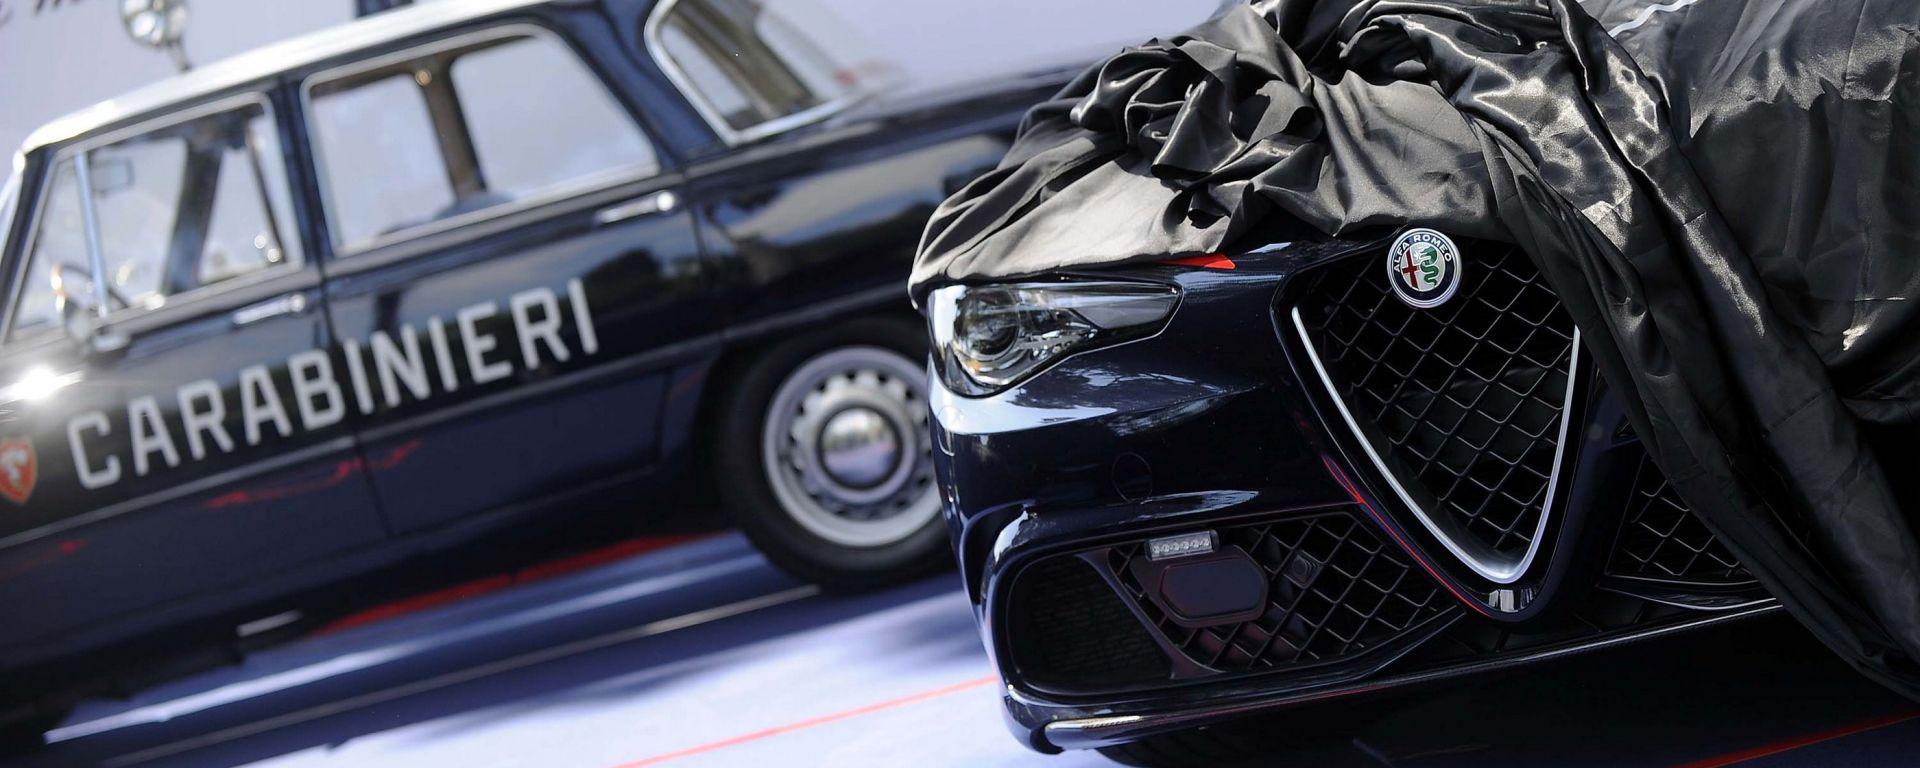 Alfa Romeo Giulia Quadrifoglio arruolata nei Carabinieri